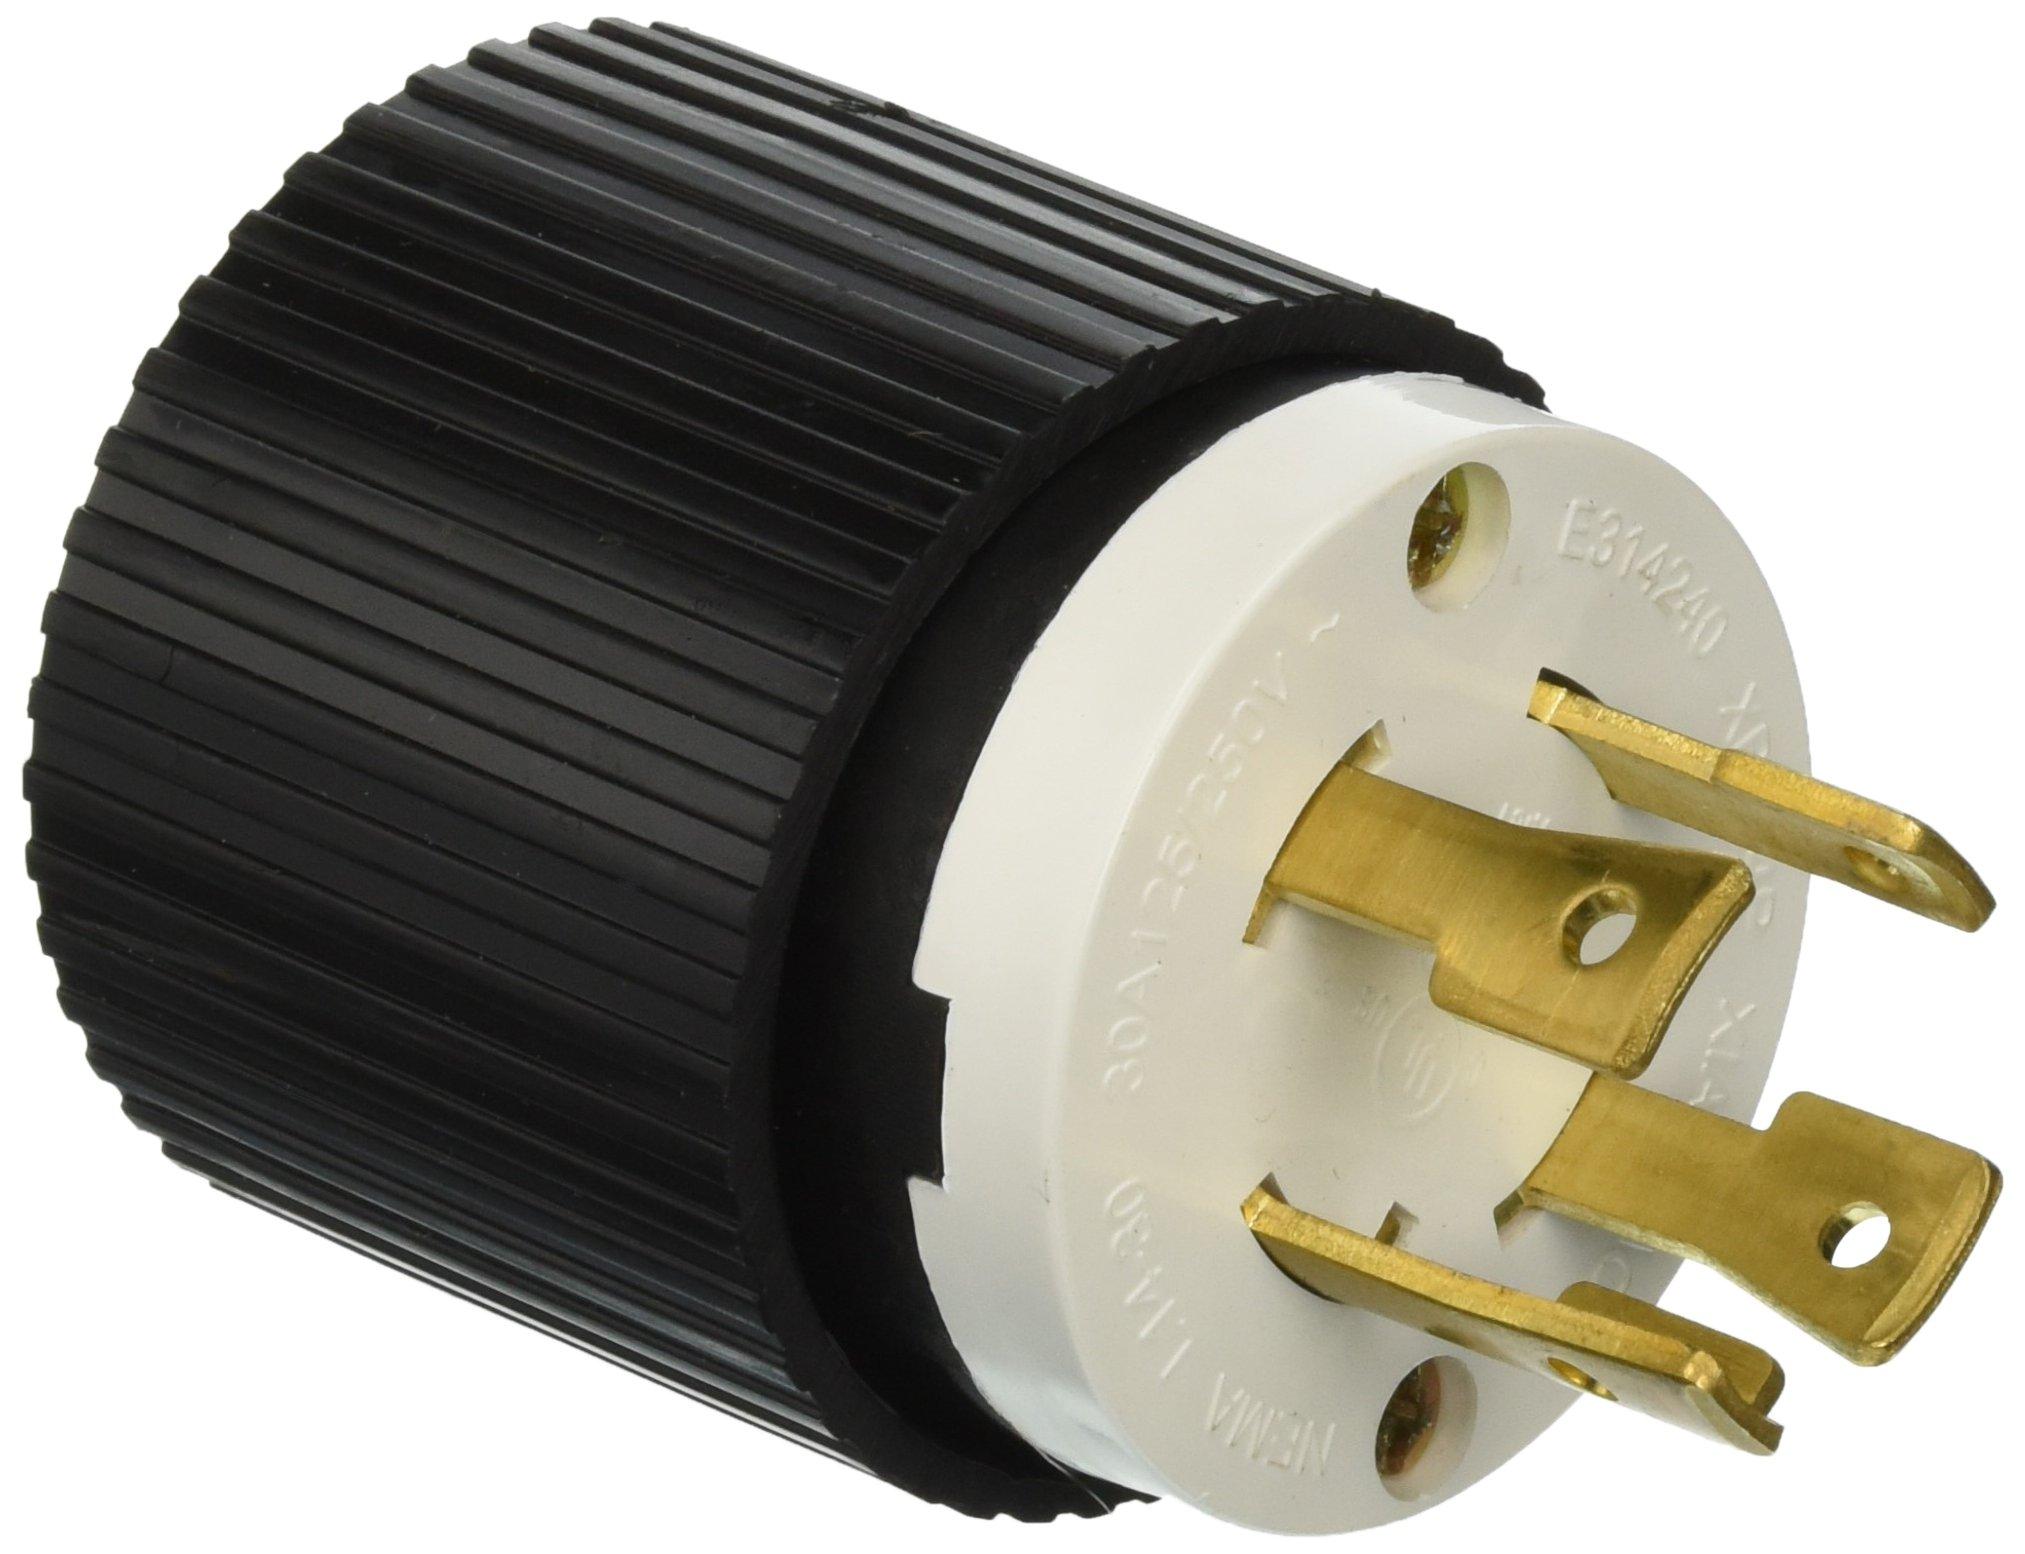 amazon com plug l14 30 30a 125 250v 30p locking generator cable L14-30 Plug Wiring Diagram